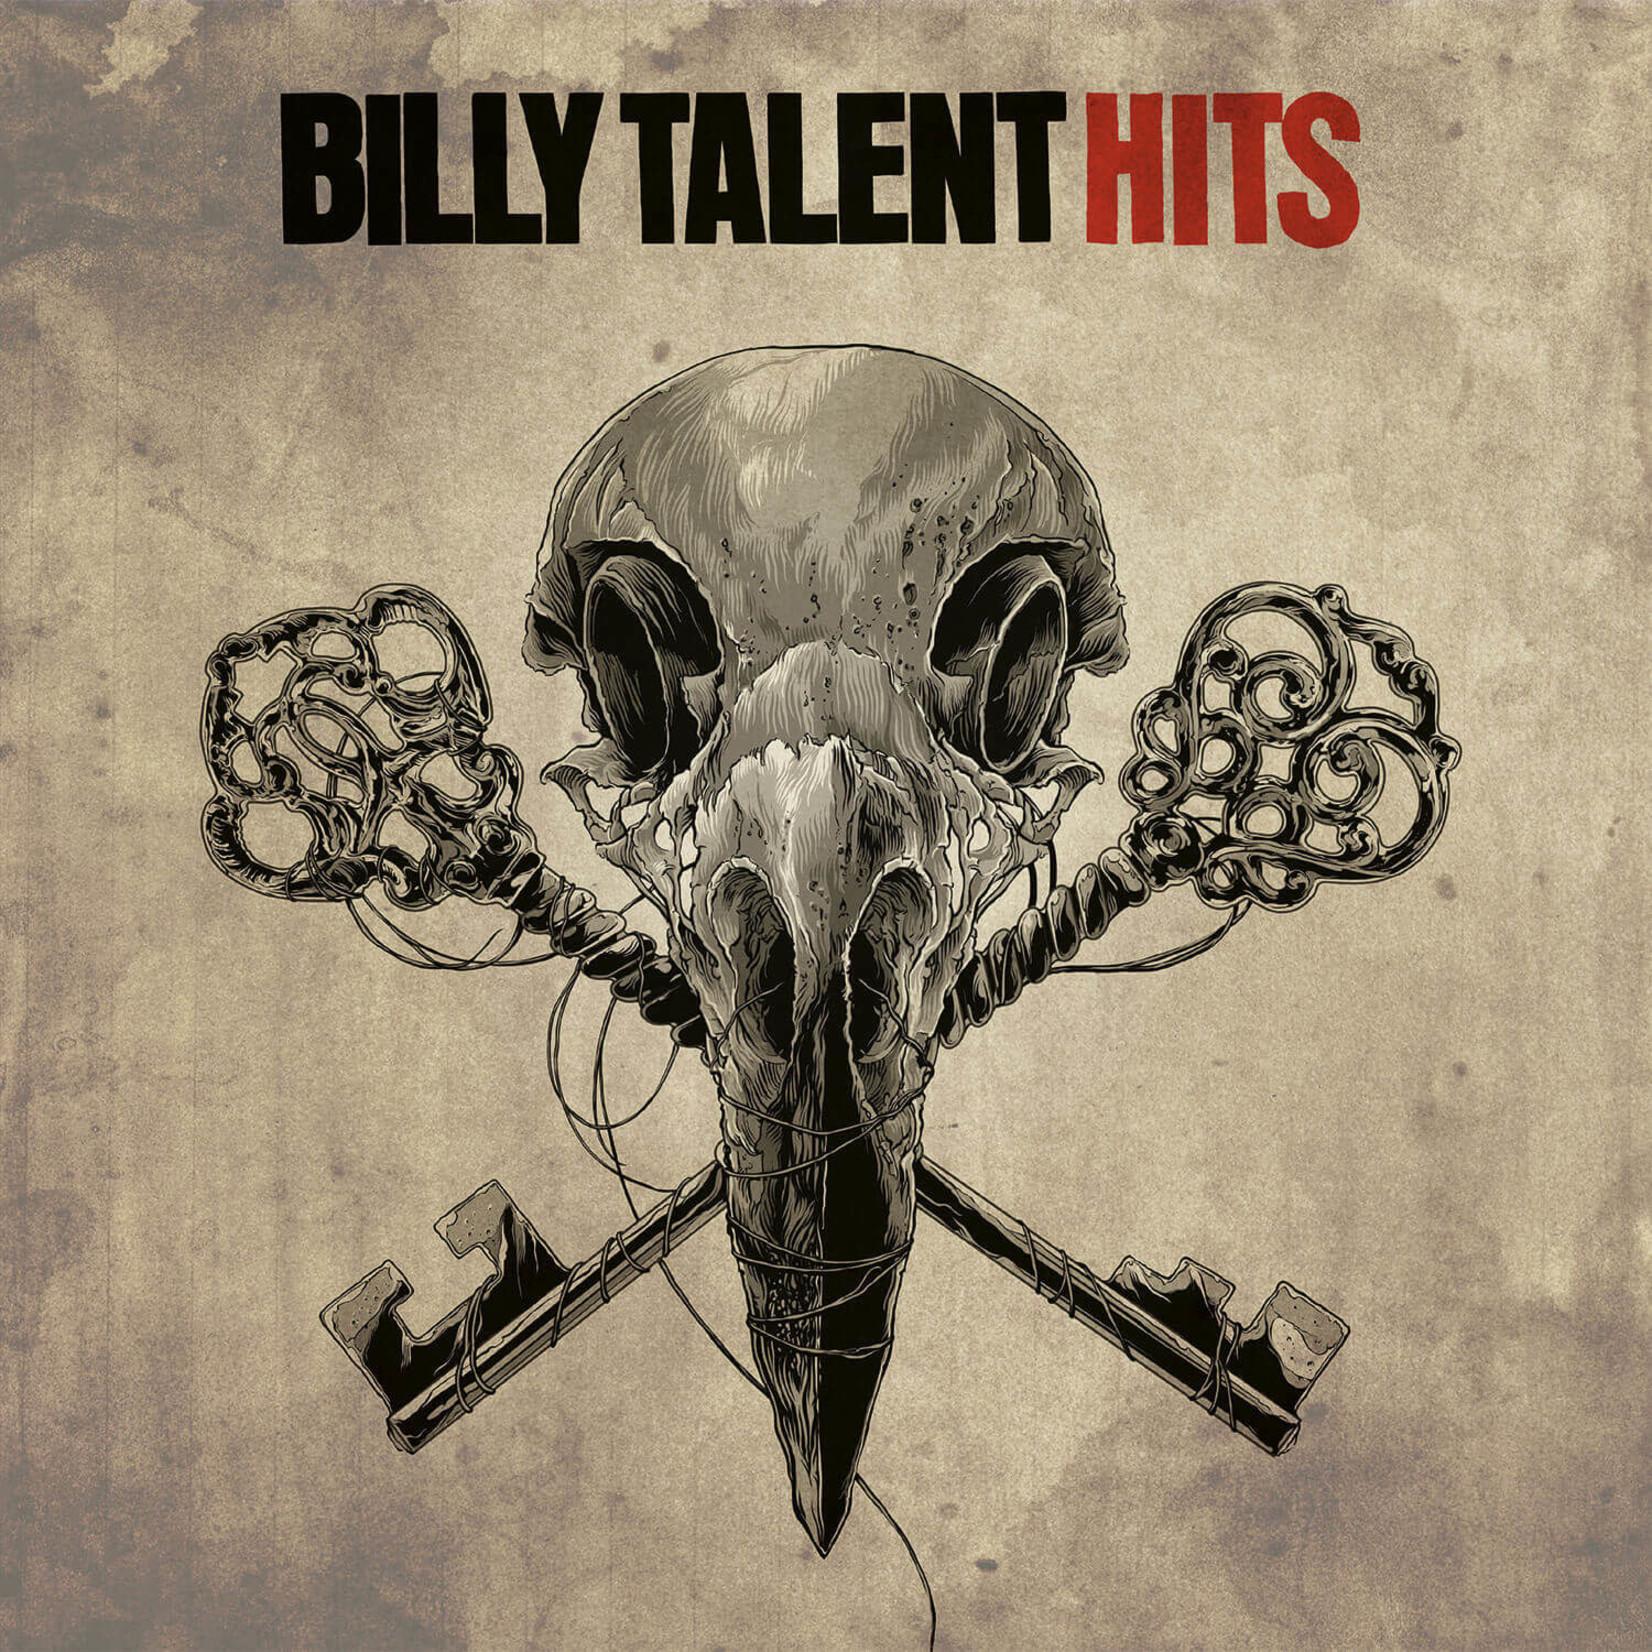 [New] Billy Talent: Hits (2LP, 180g, incl. art print)